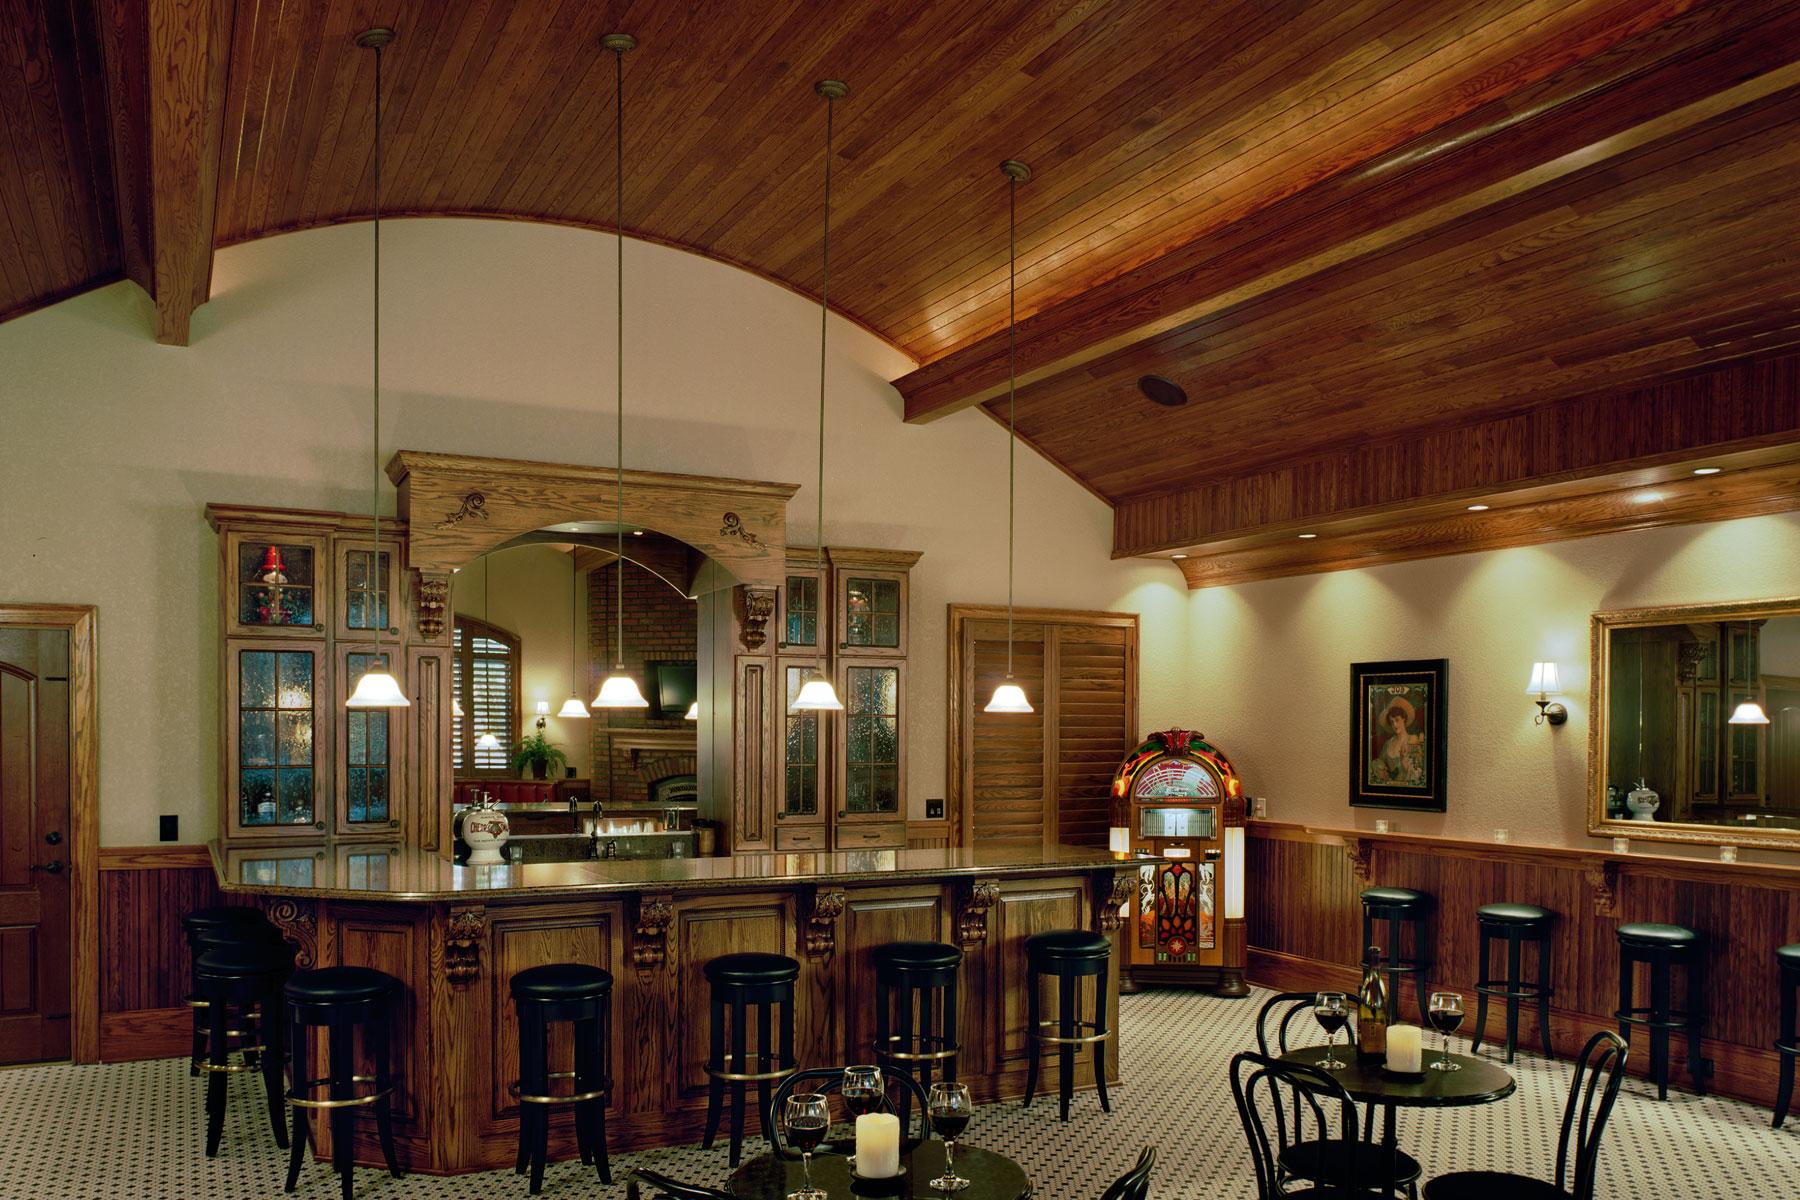 custom-bar-design-gentlemans-pub-barrel-vault-ceiling